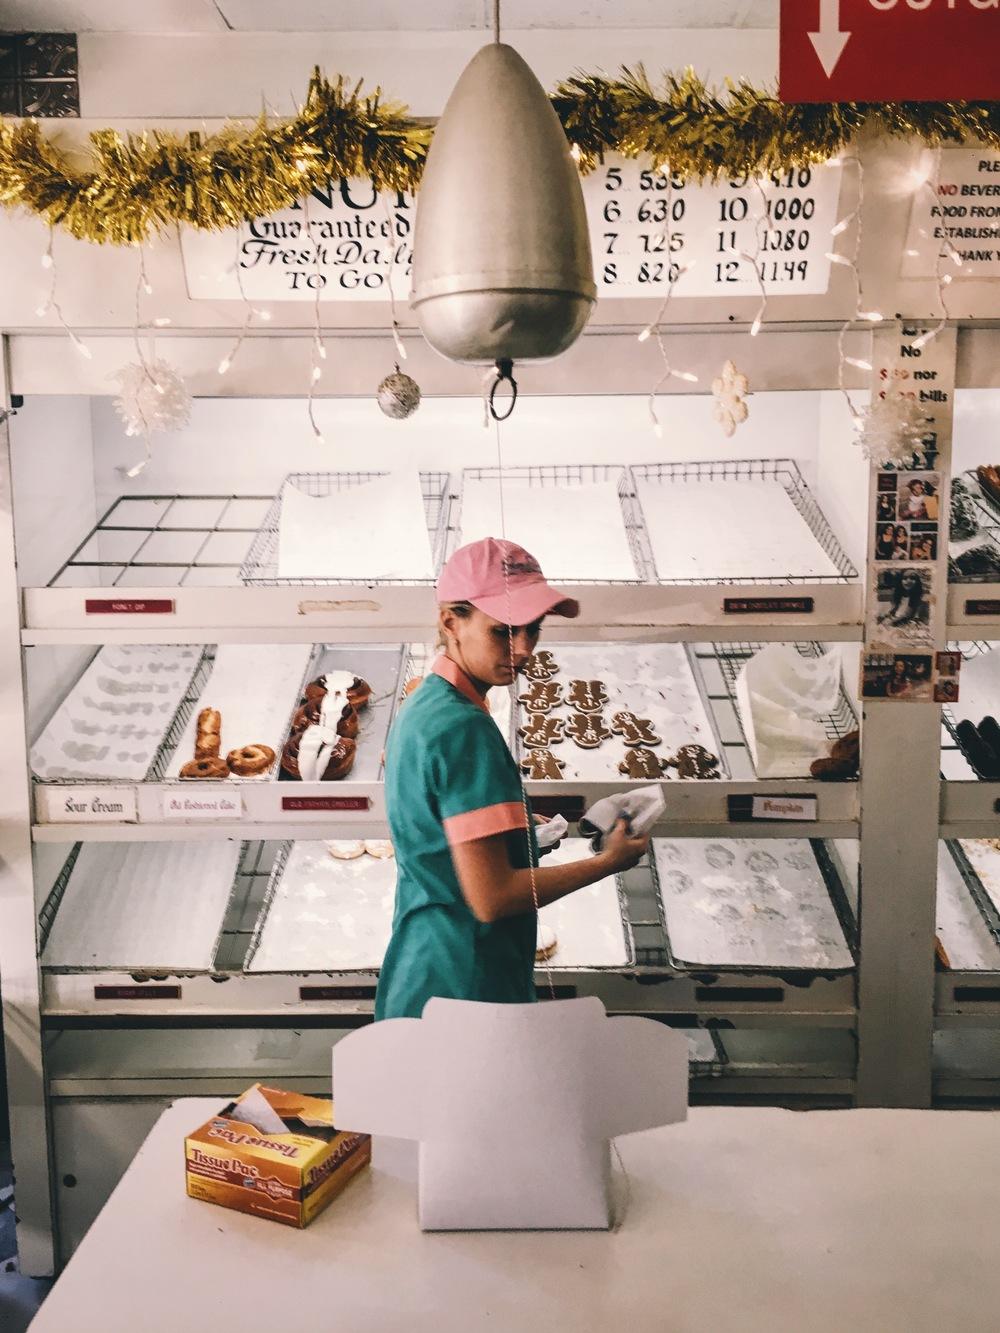 peter_pan_donuts.jpg